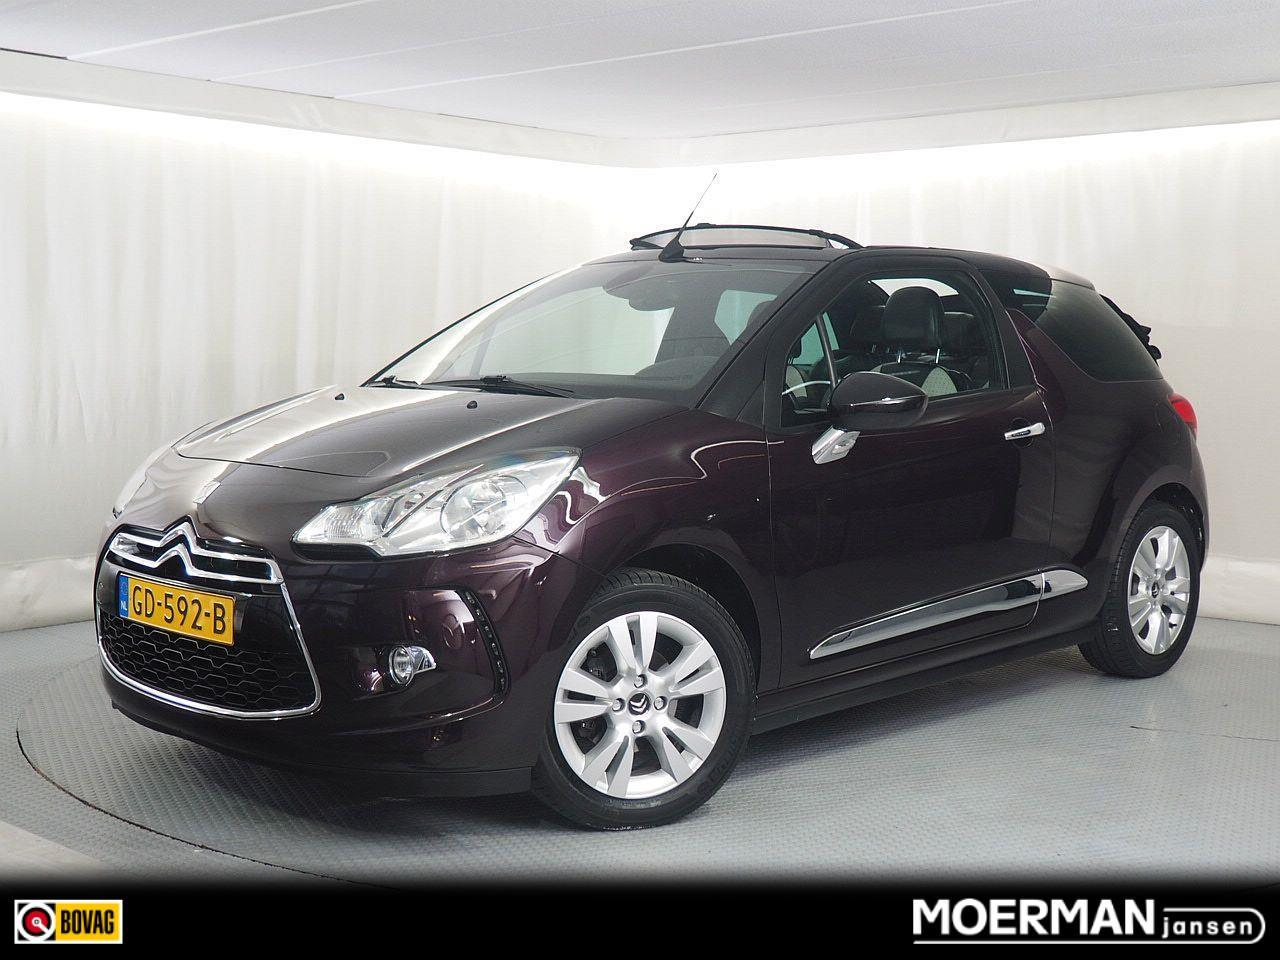 Citroën Ds3 Cabrio 1.2 puretech so chic / leder / navigatie / dealer onderhouden / 1e eigenaar